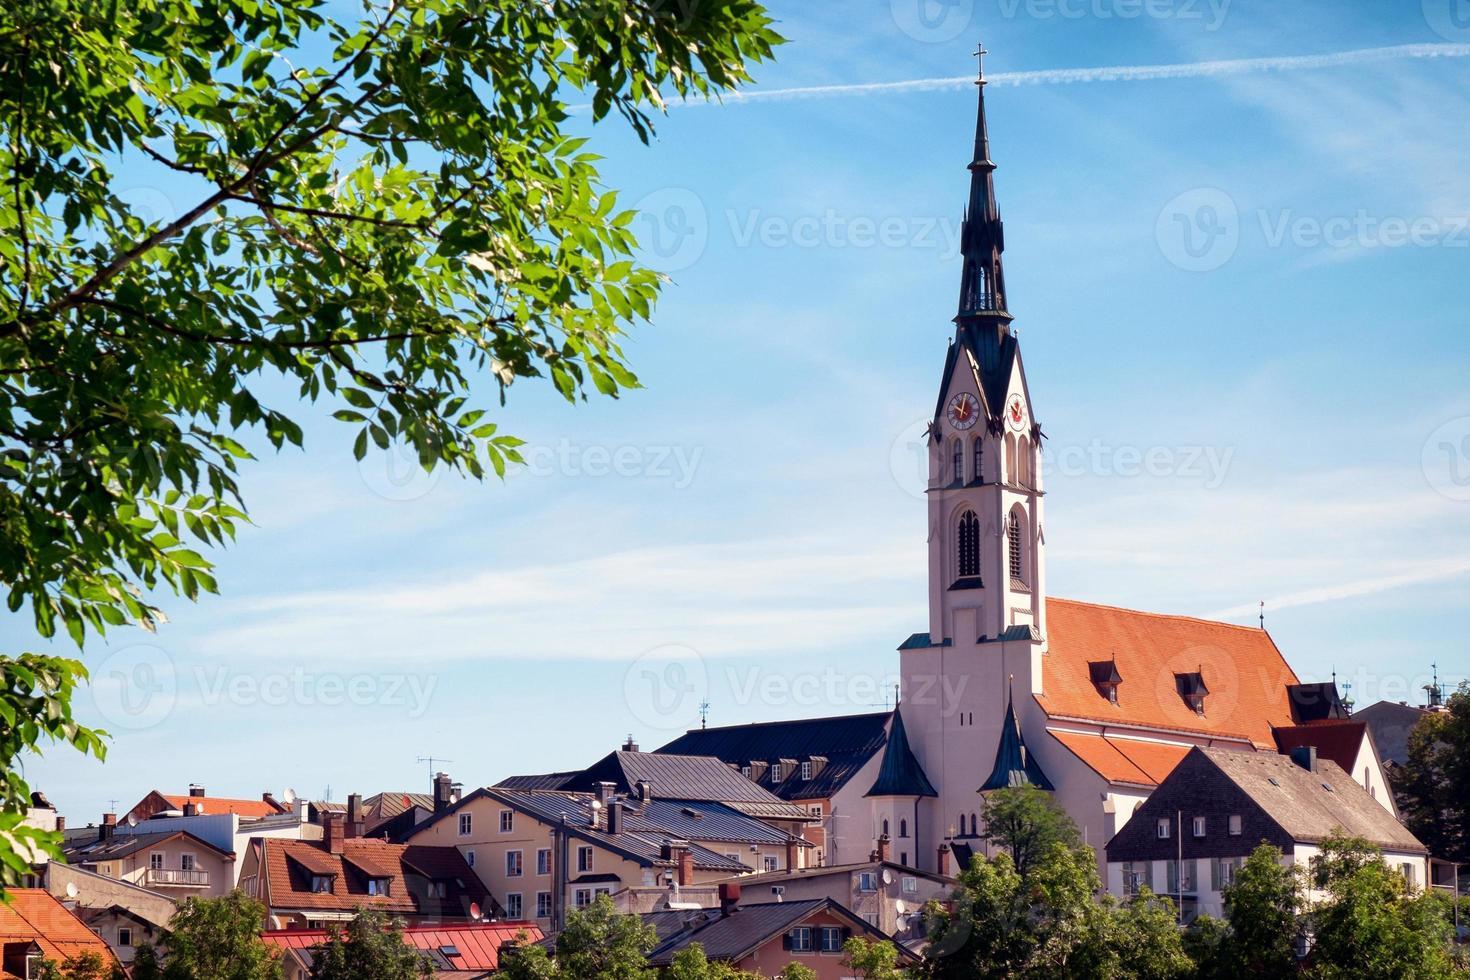 berömda bayerska kyrkan foto